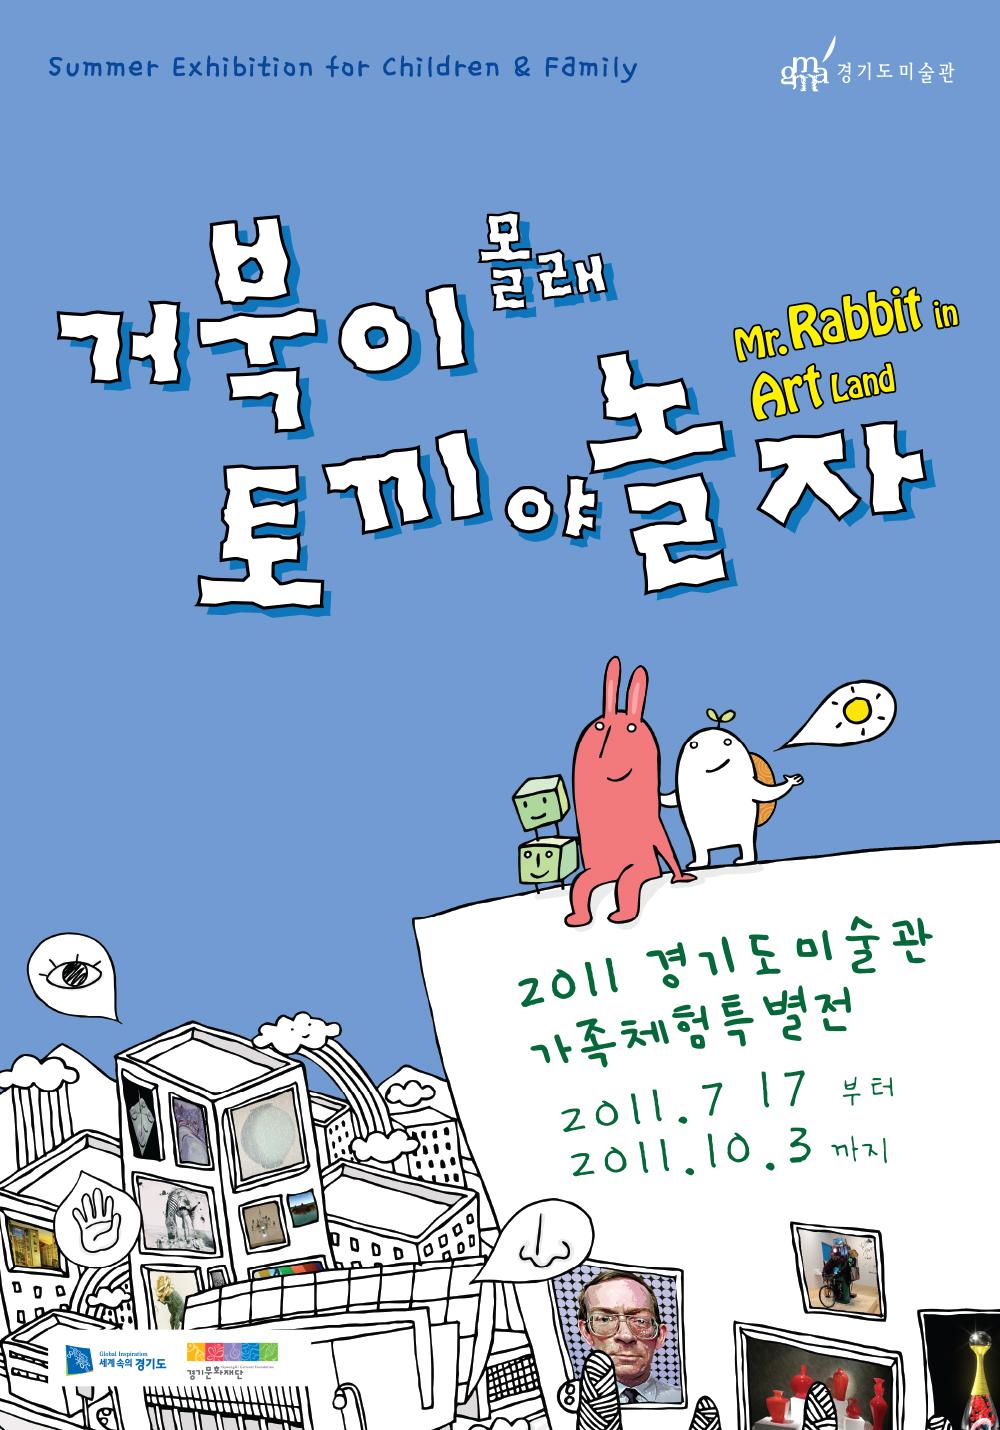 Mr. Rabbit in Art Land